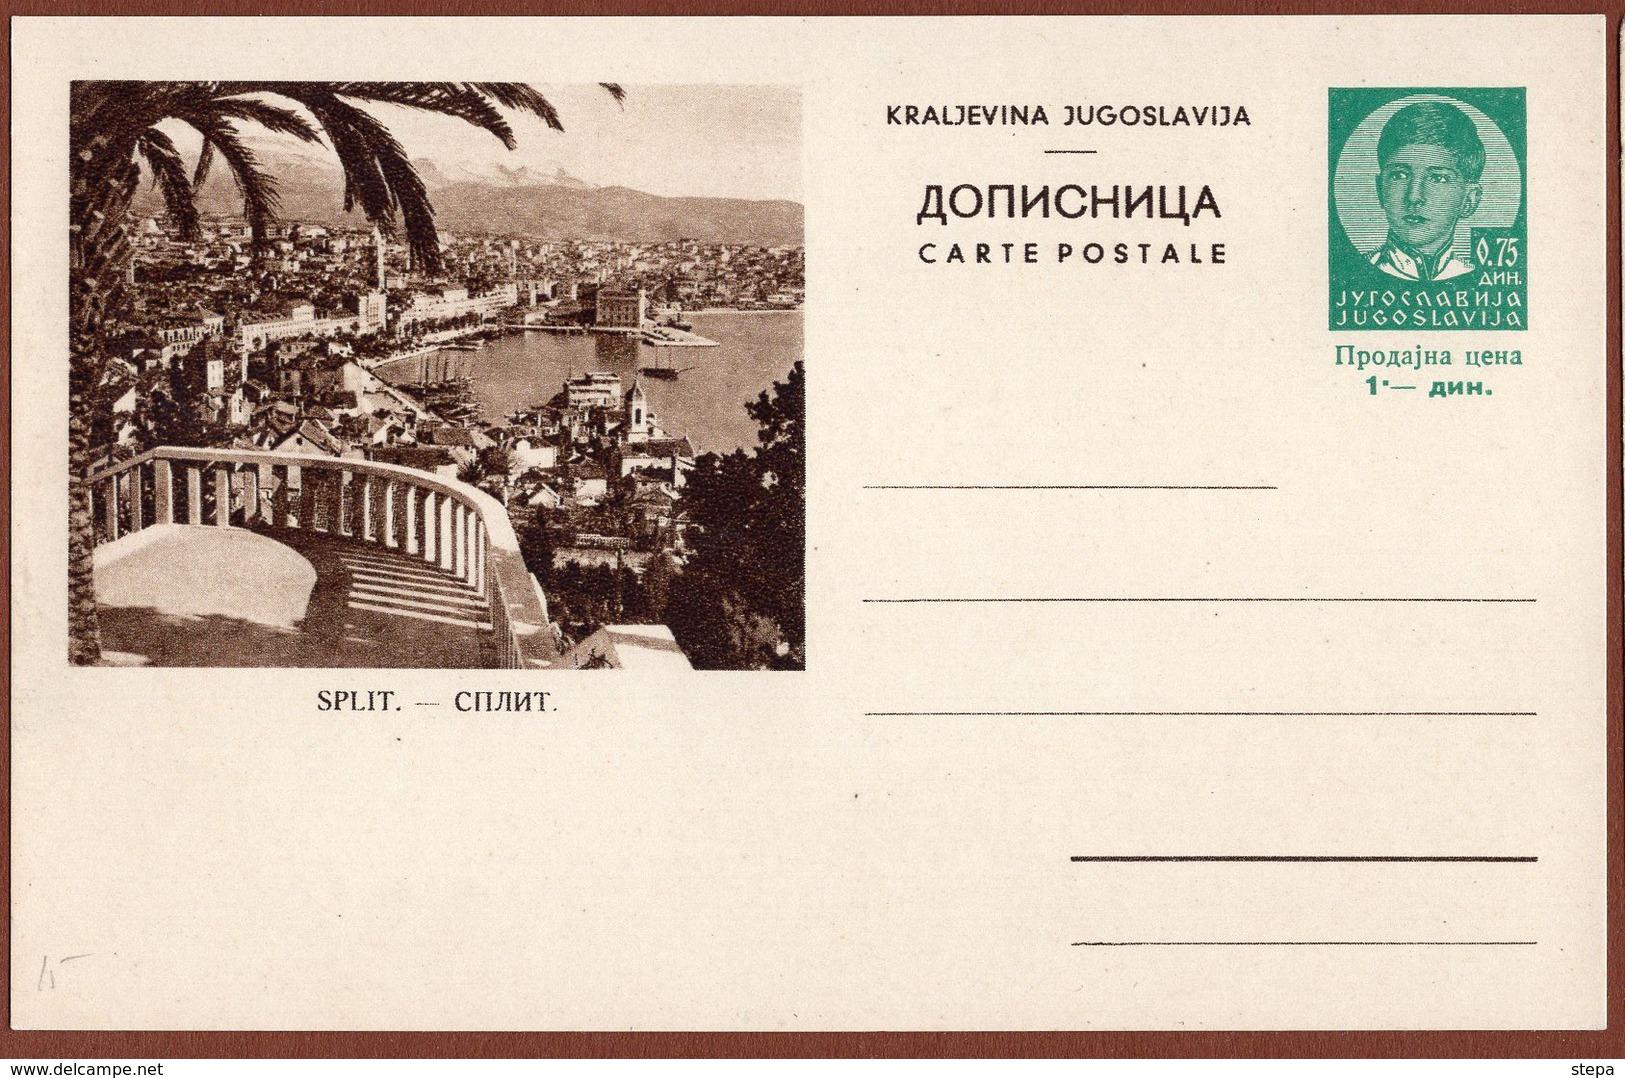 YUGOSLAVIA-CROATIA, SPLIT, 3rd EDITION For DOMESTIC TRAFFIC ILLUSTRATED POSTAL CARD - Entiers Postaux